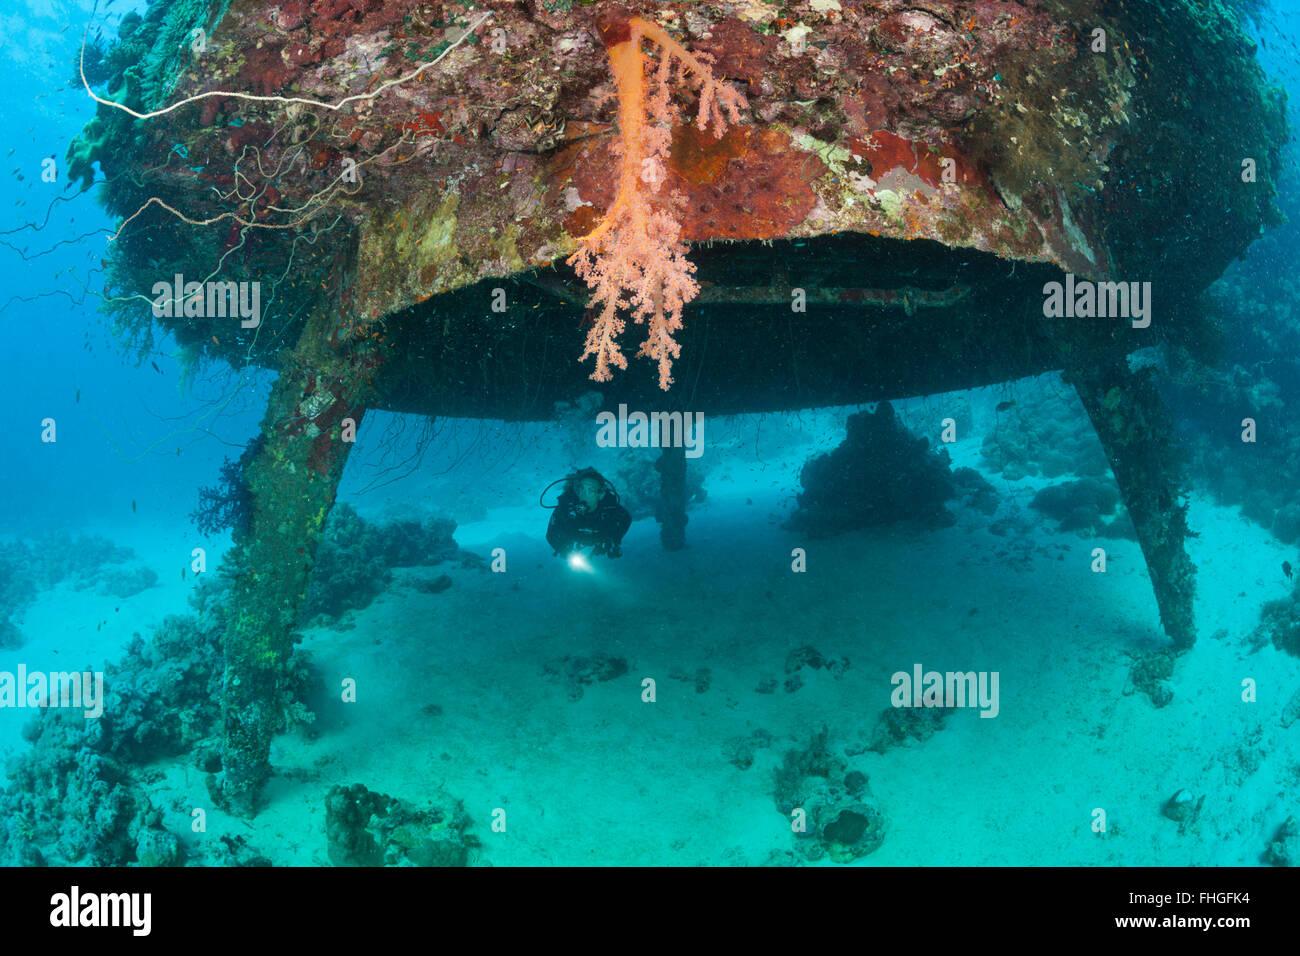 Diving Cousteaus Underwater Habitat Precontinent II, Shaab Rumi, Red Sea, Sudan - Stock Image